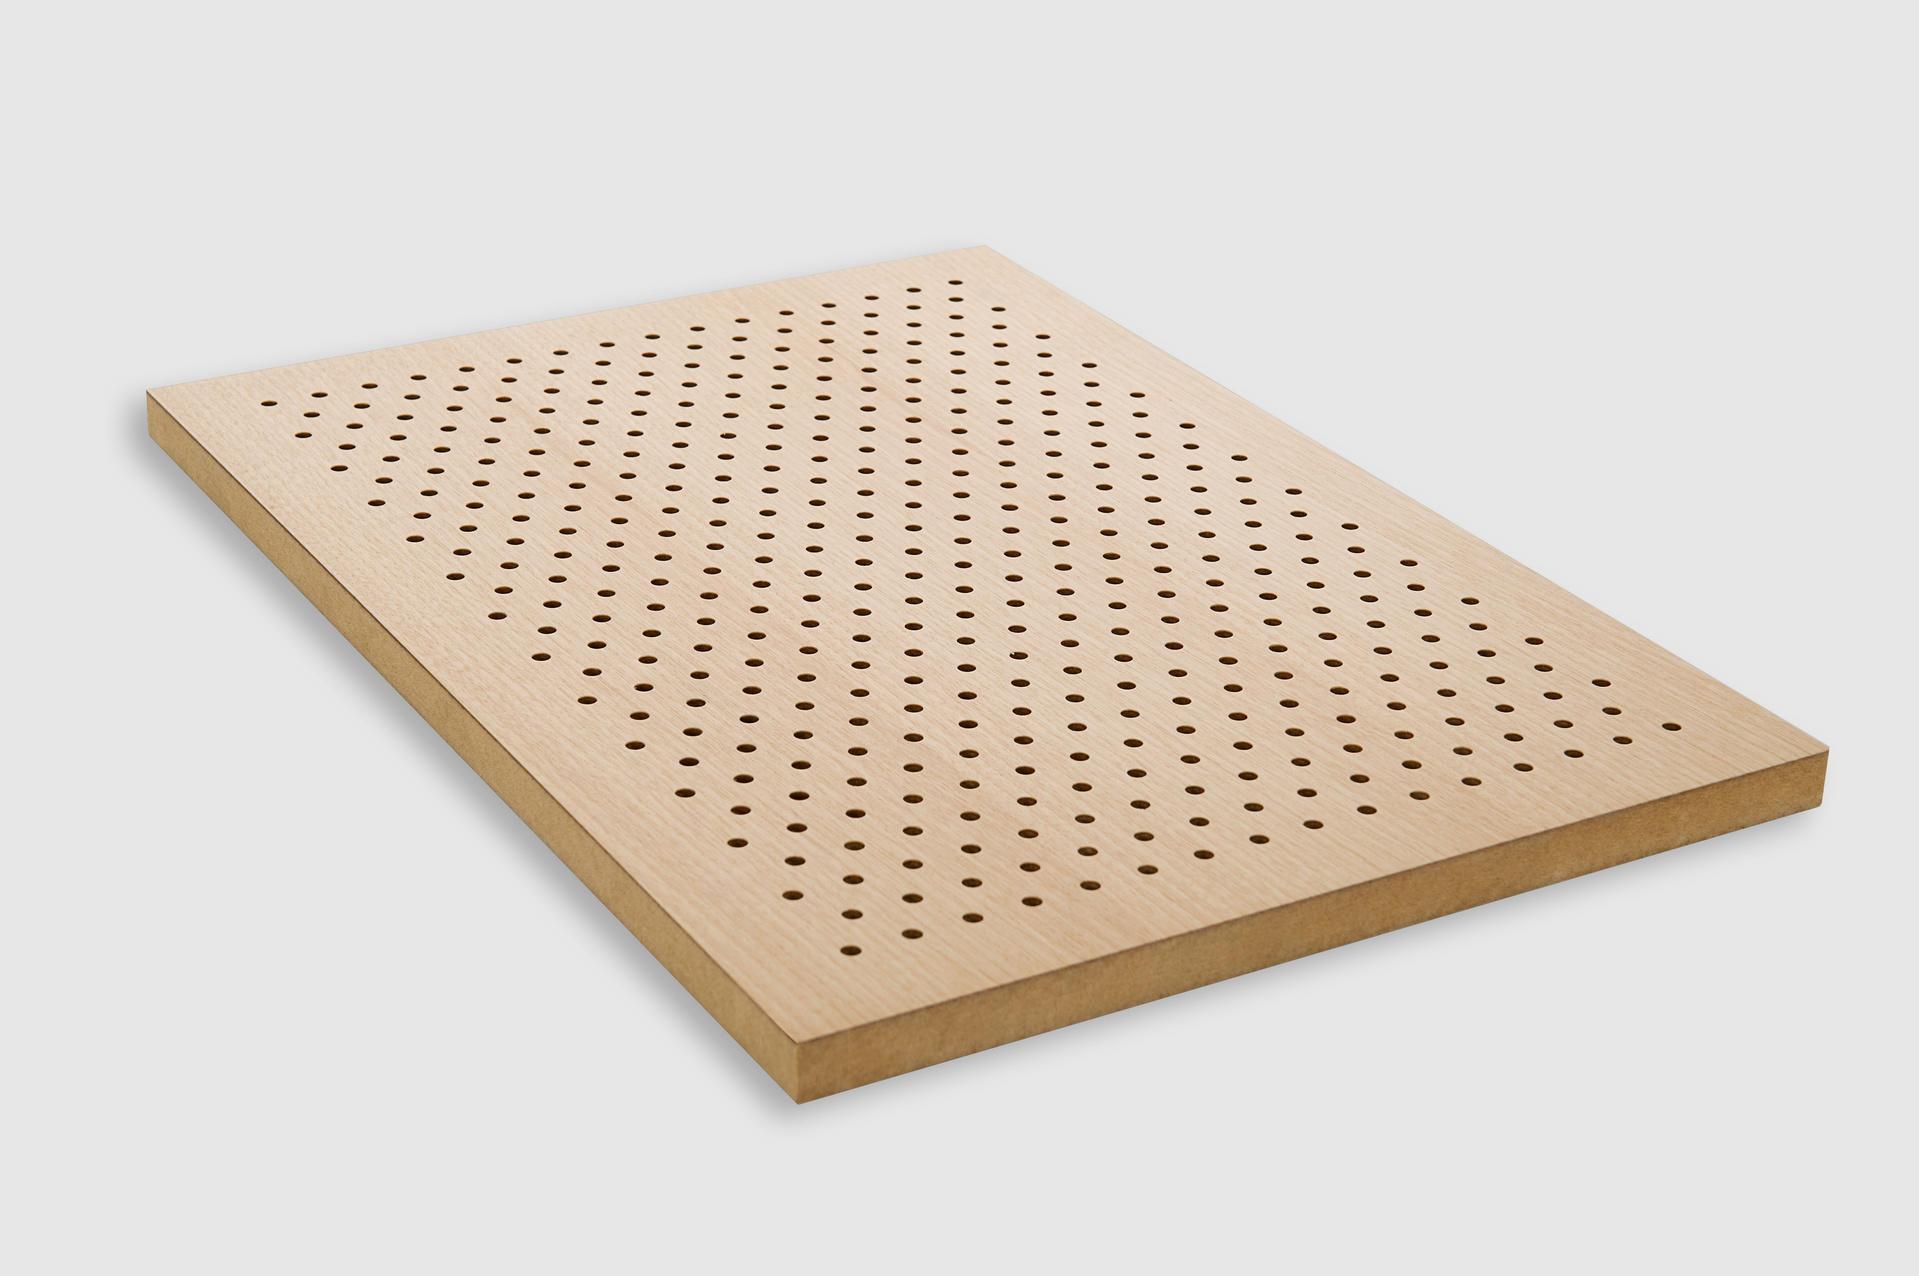 lochplatten akustikbau akustikbausysteme firma kaiser akustik gmbh produkte akustikplatten. Black Bedroom Furniture Sets. Home Design Ideas